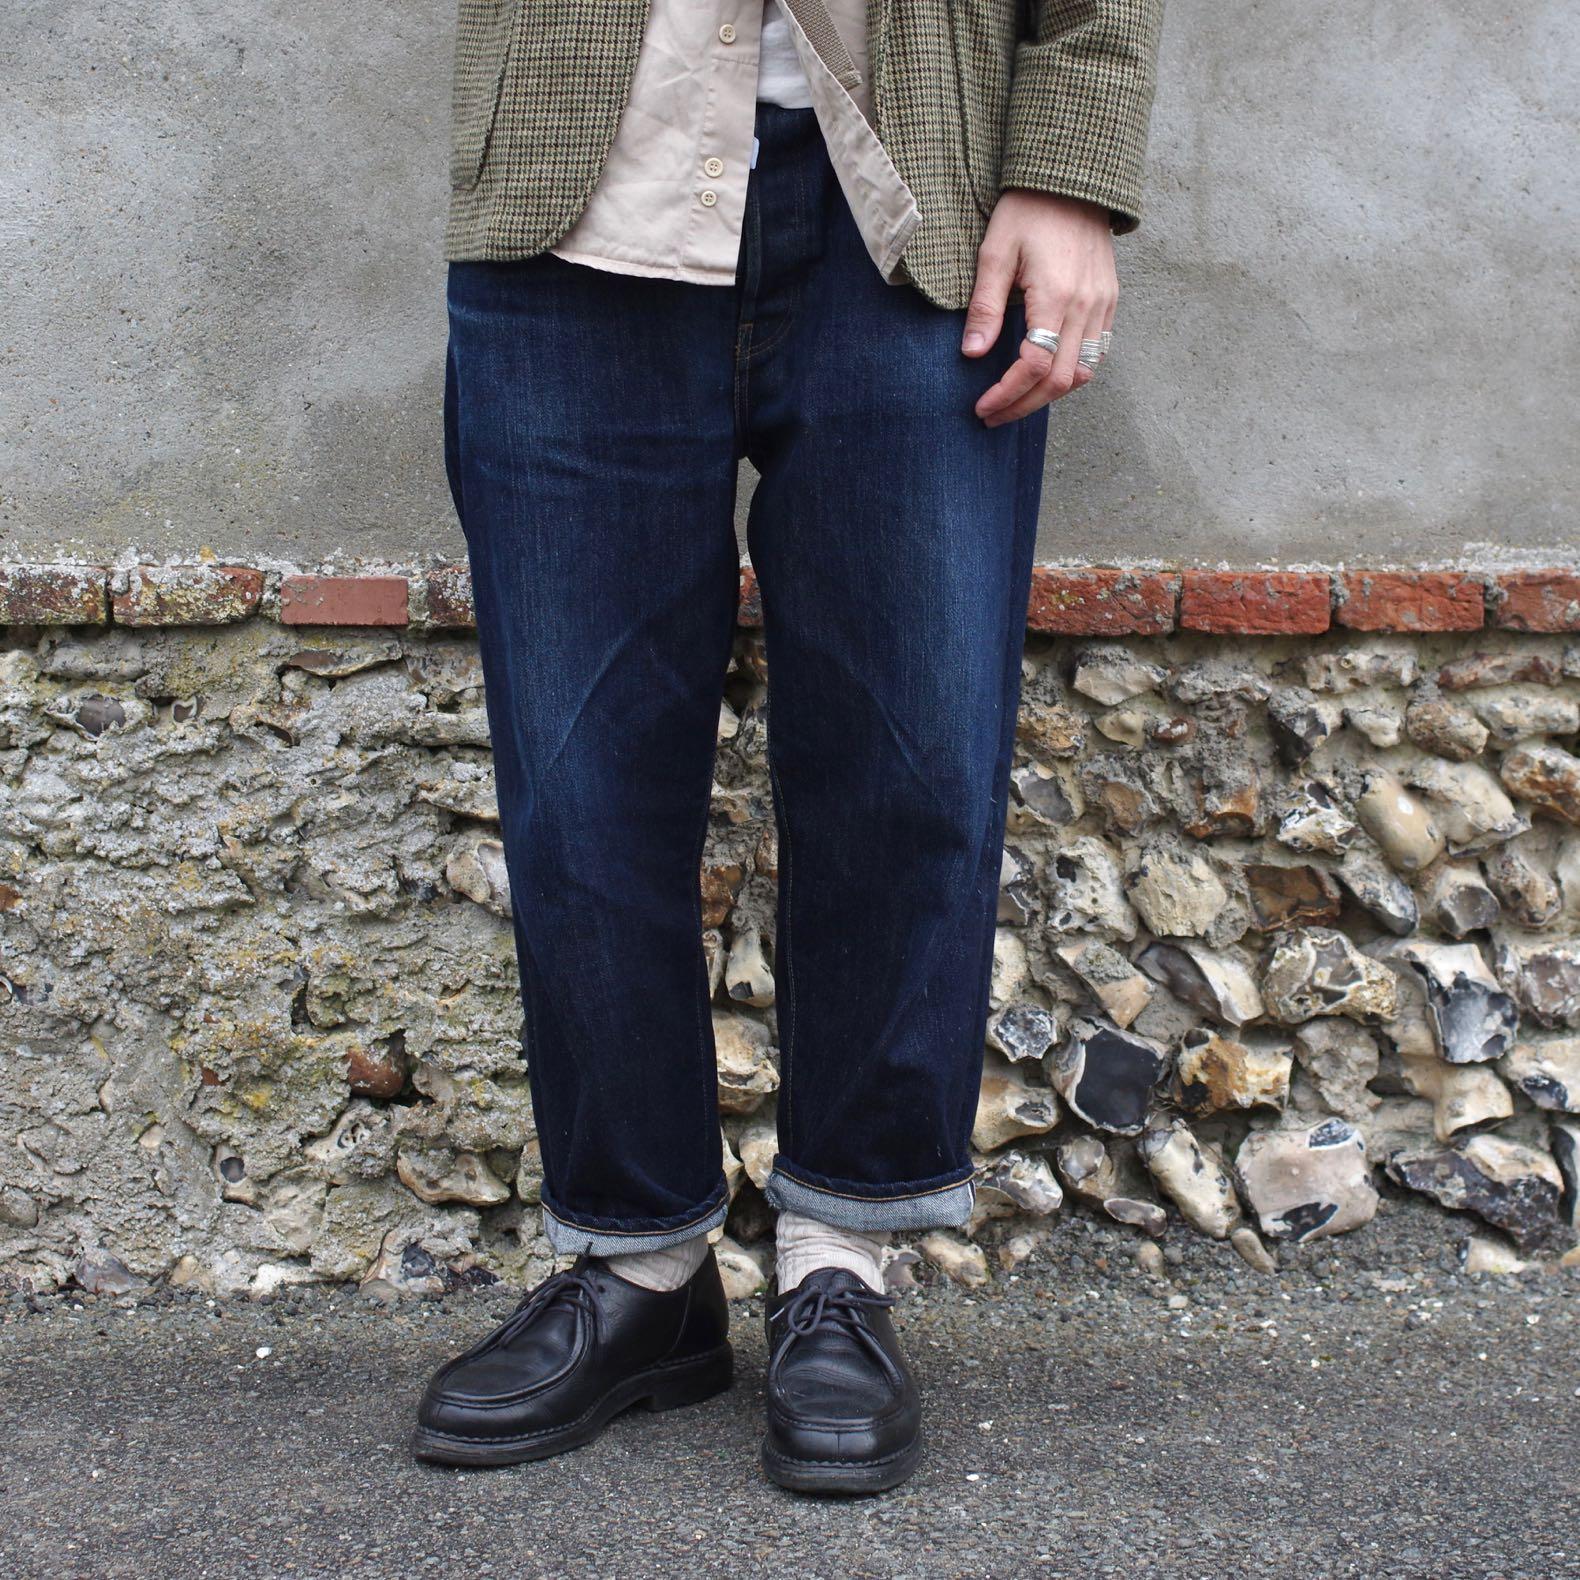 jean coupe tapered en toile de dneim brut de la marque hatski